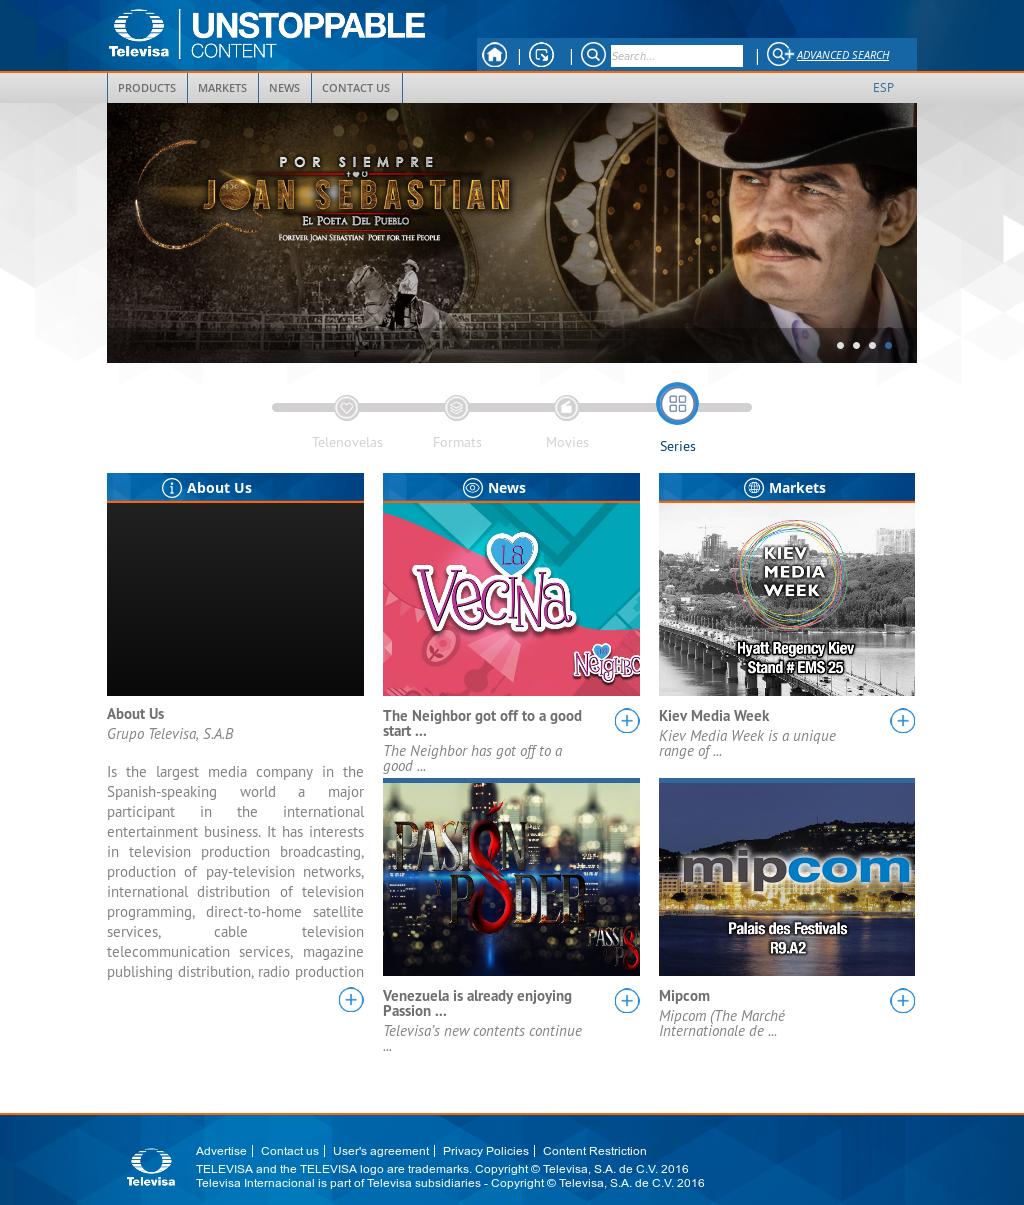 Televisa Internacional Competitors, Revenue and Employees